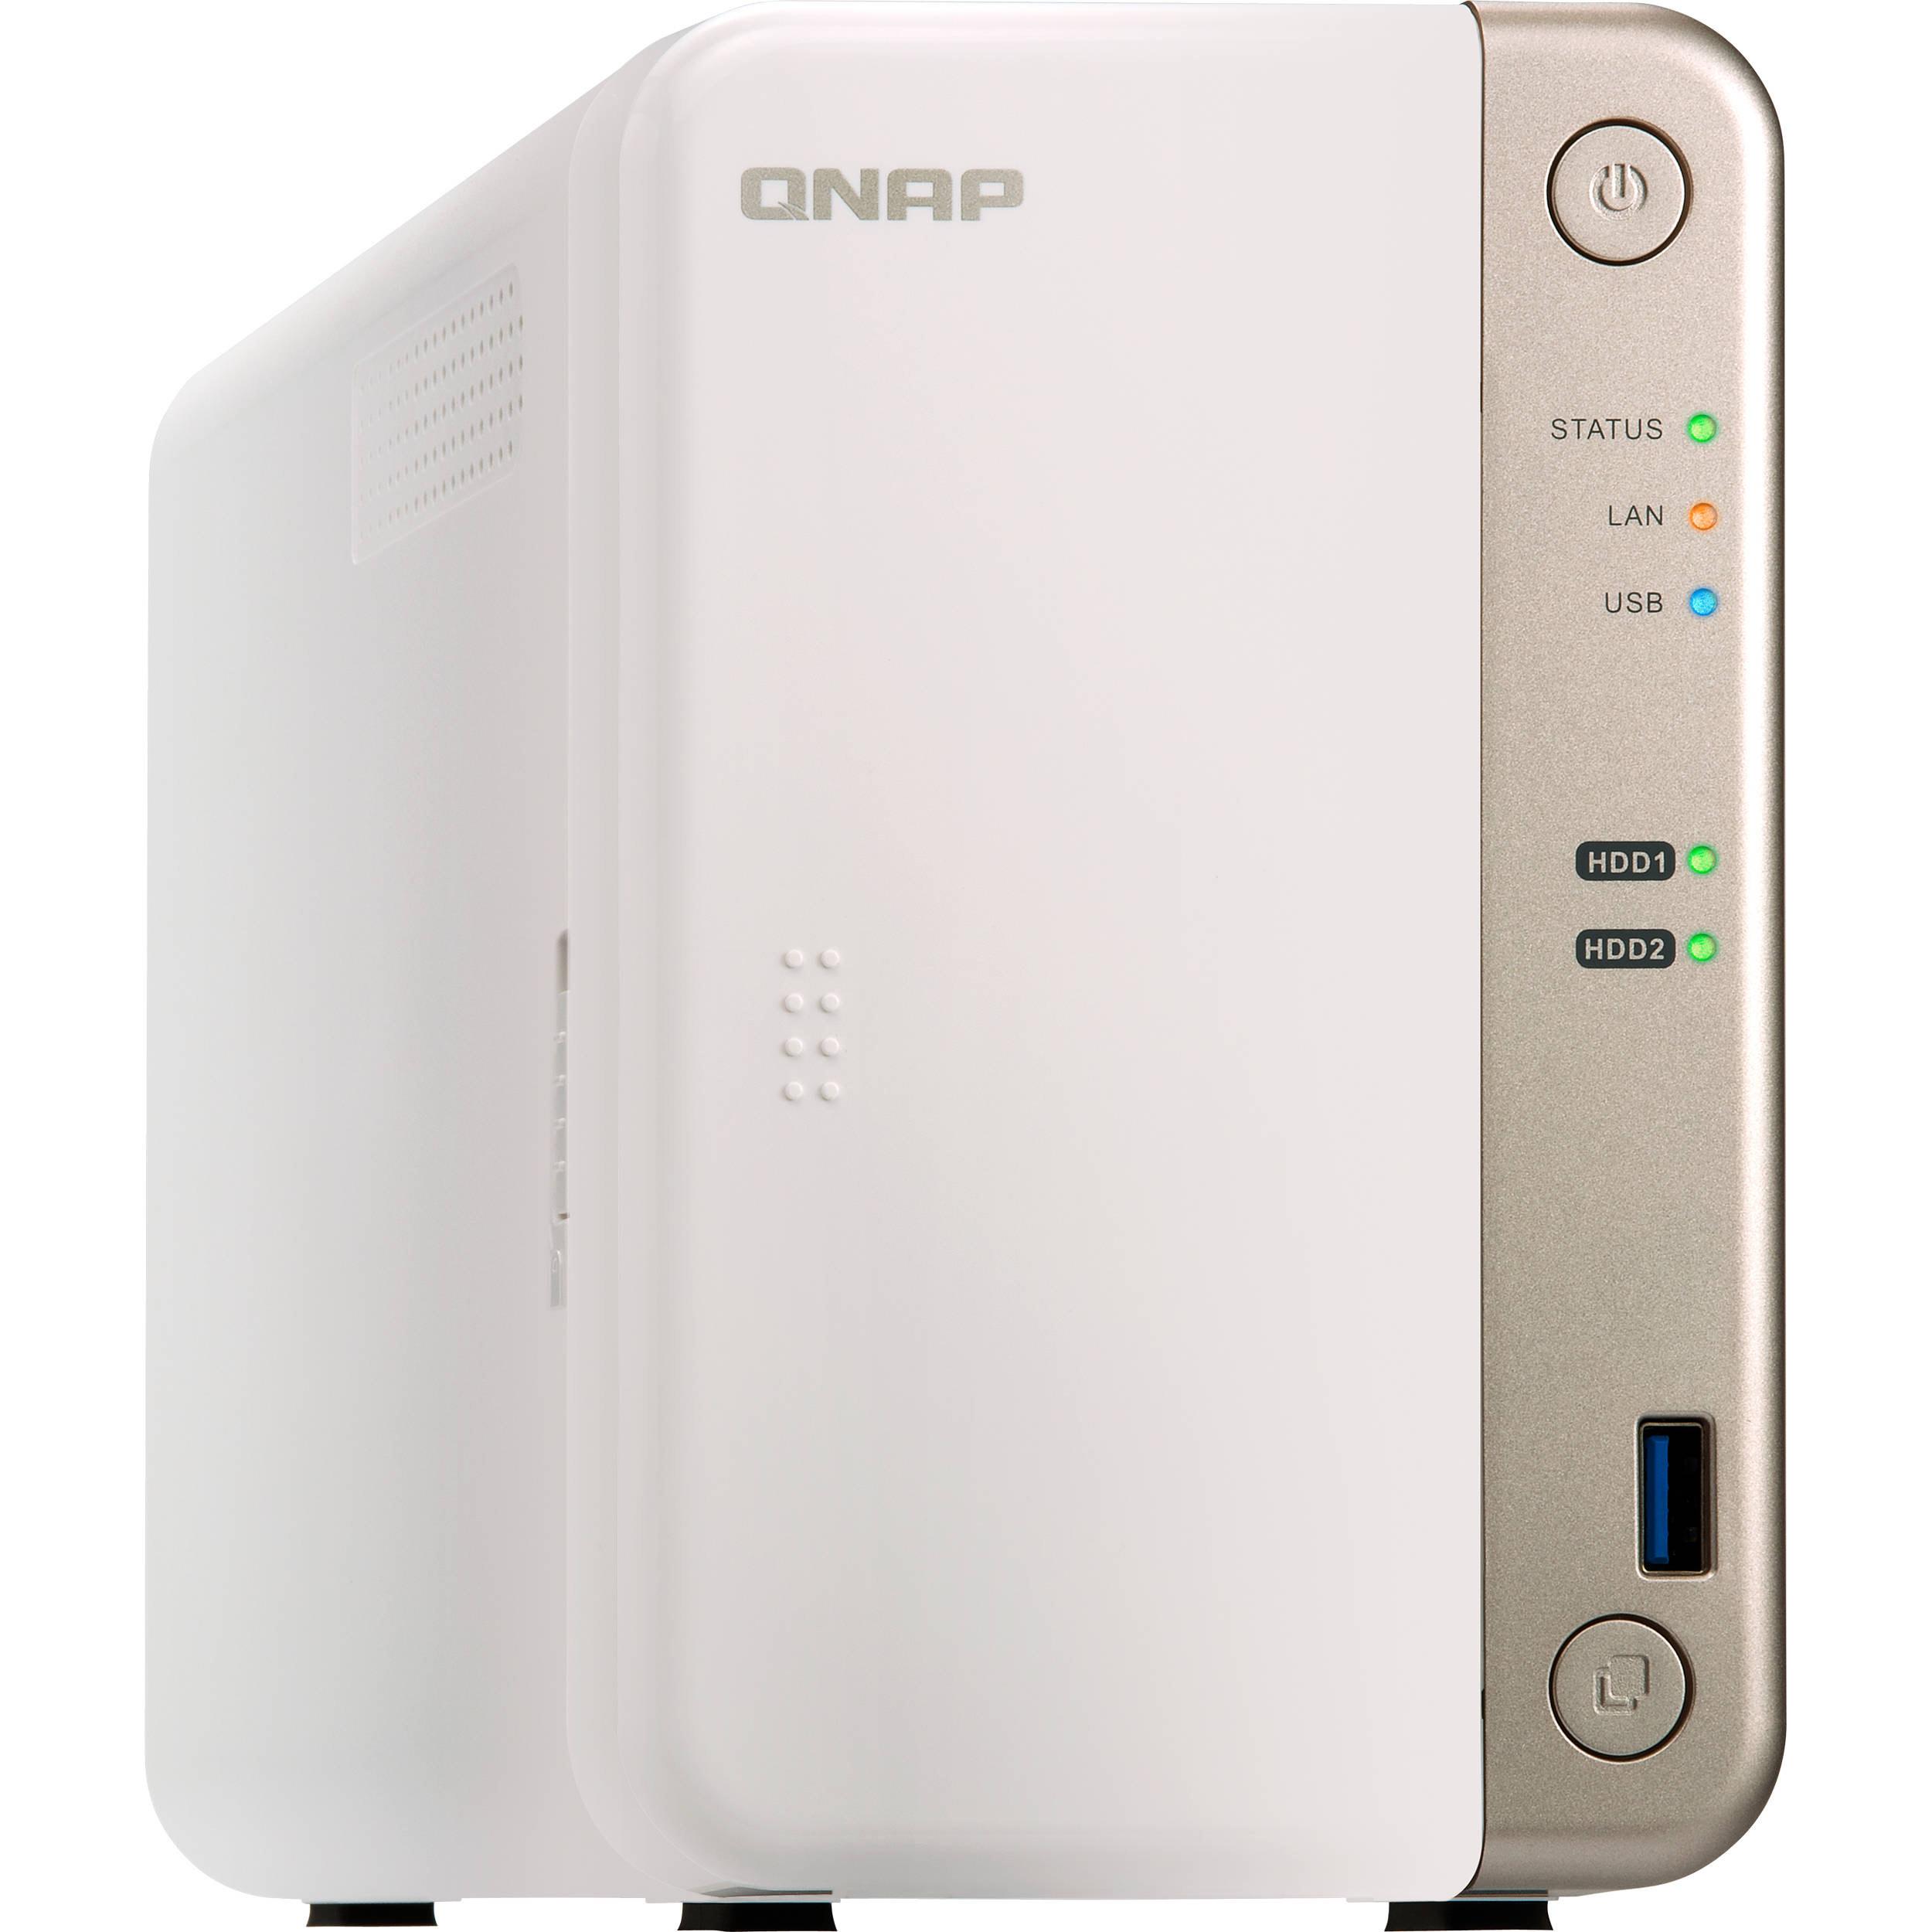 QNAP TS-251B-4G, 2bay, 4GB RAM, Intel Dual-core CPU, PCIe slot x1, NAS £278.51 at Amazon